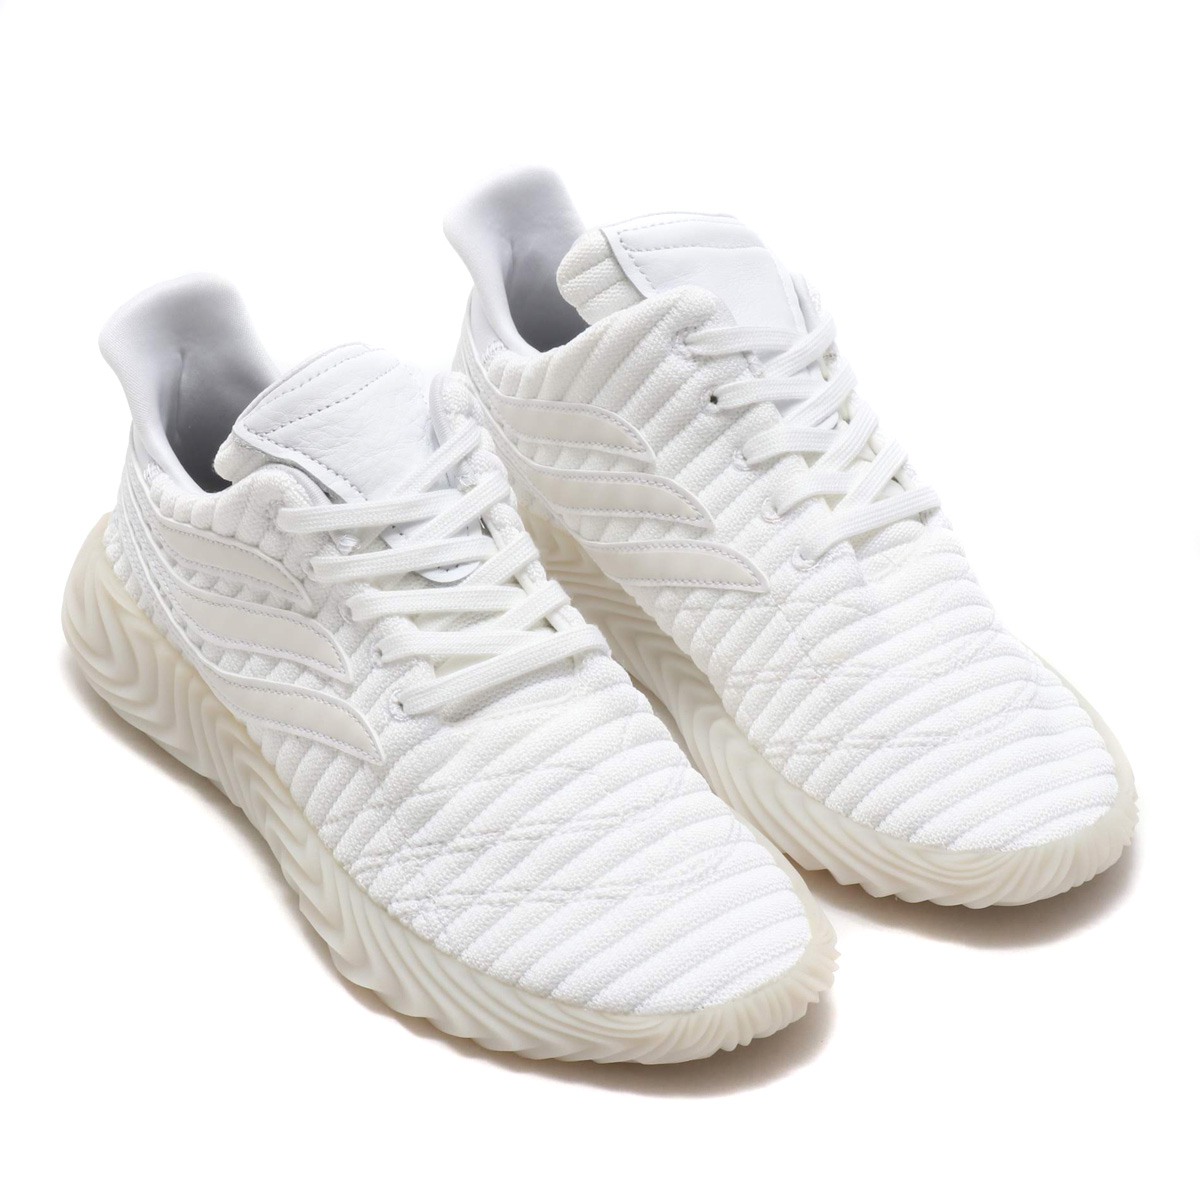 adidas Originals Sobakov(アディダス オリジナルス ソバコフ)RUNNING WHITE/CRYSTAL WHITE/CRYSTAL WHIT【メンズ スニーカー】18FW-I